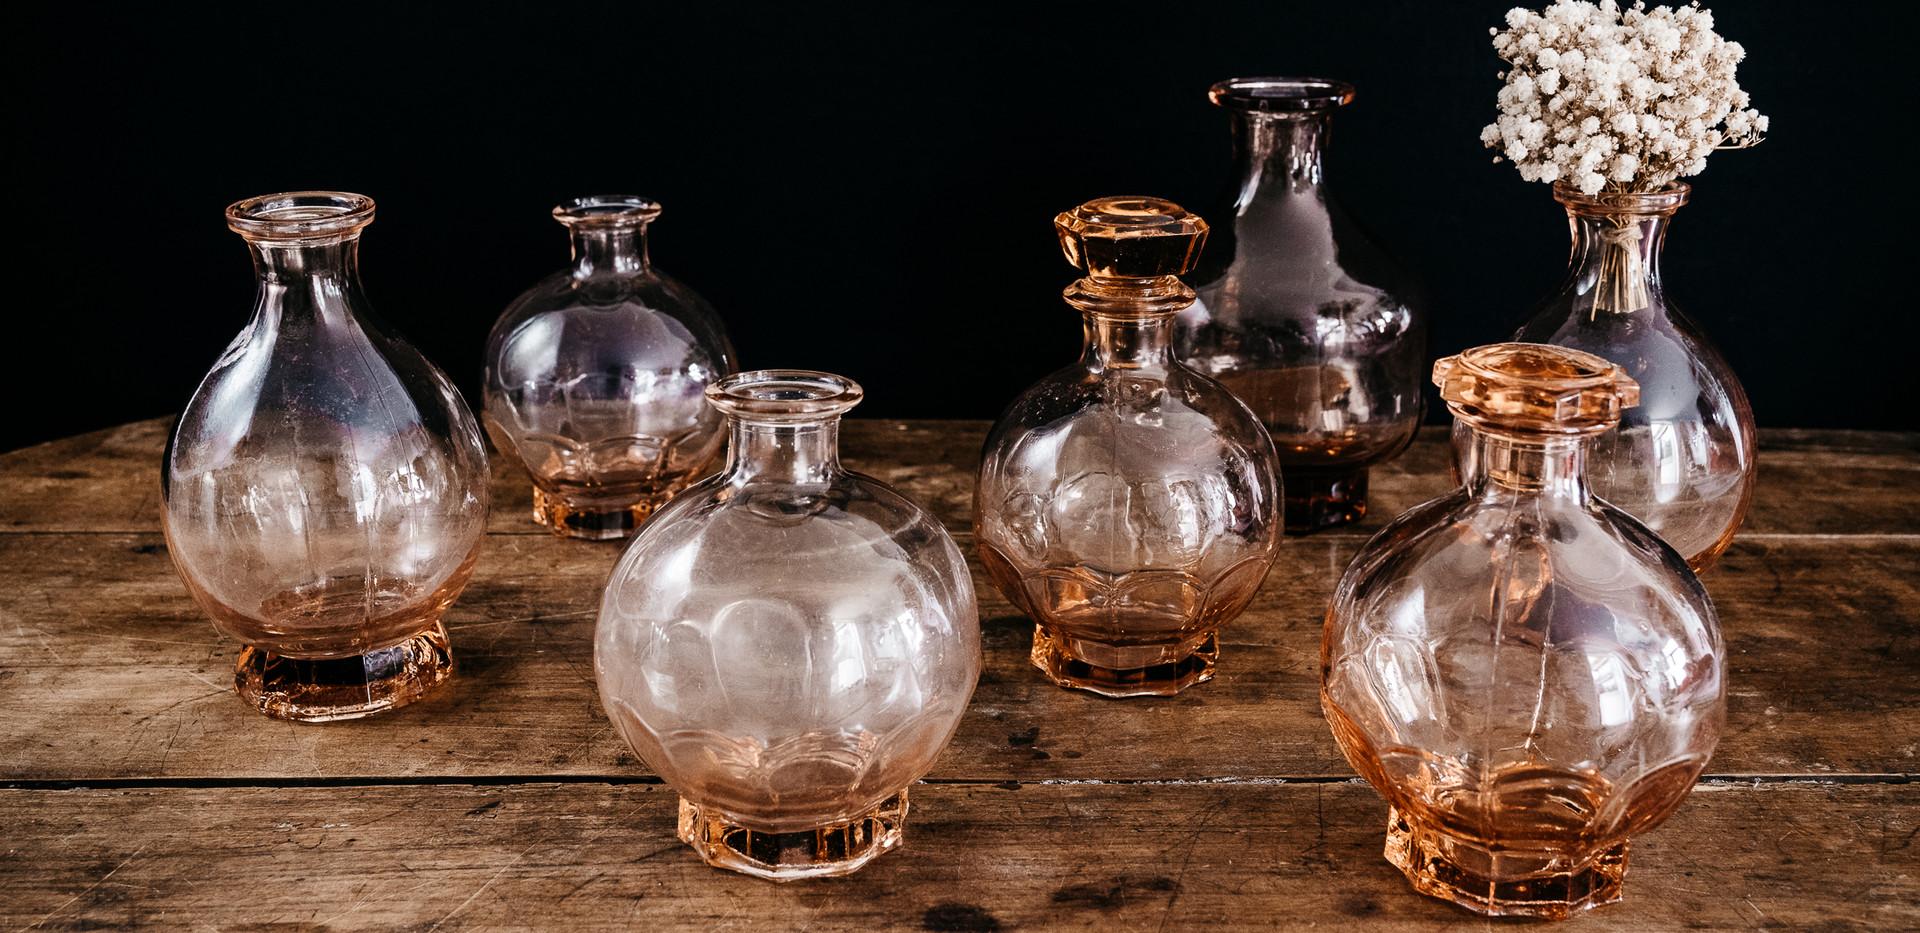 Vases roses - Photo ©Ludozme